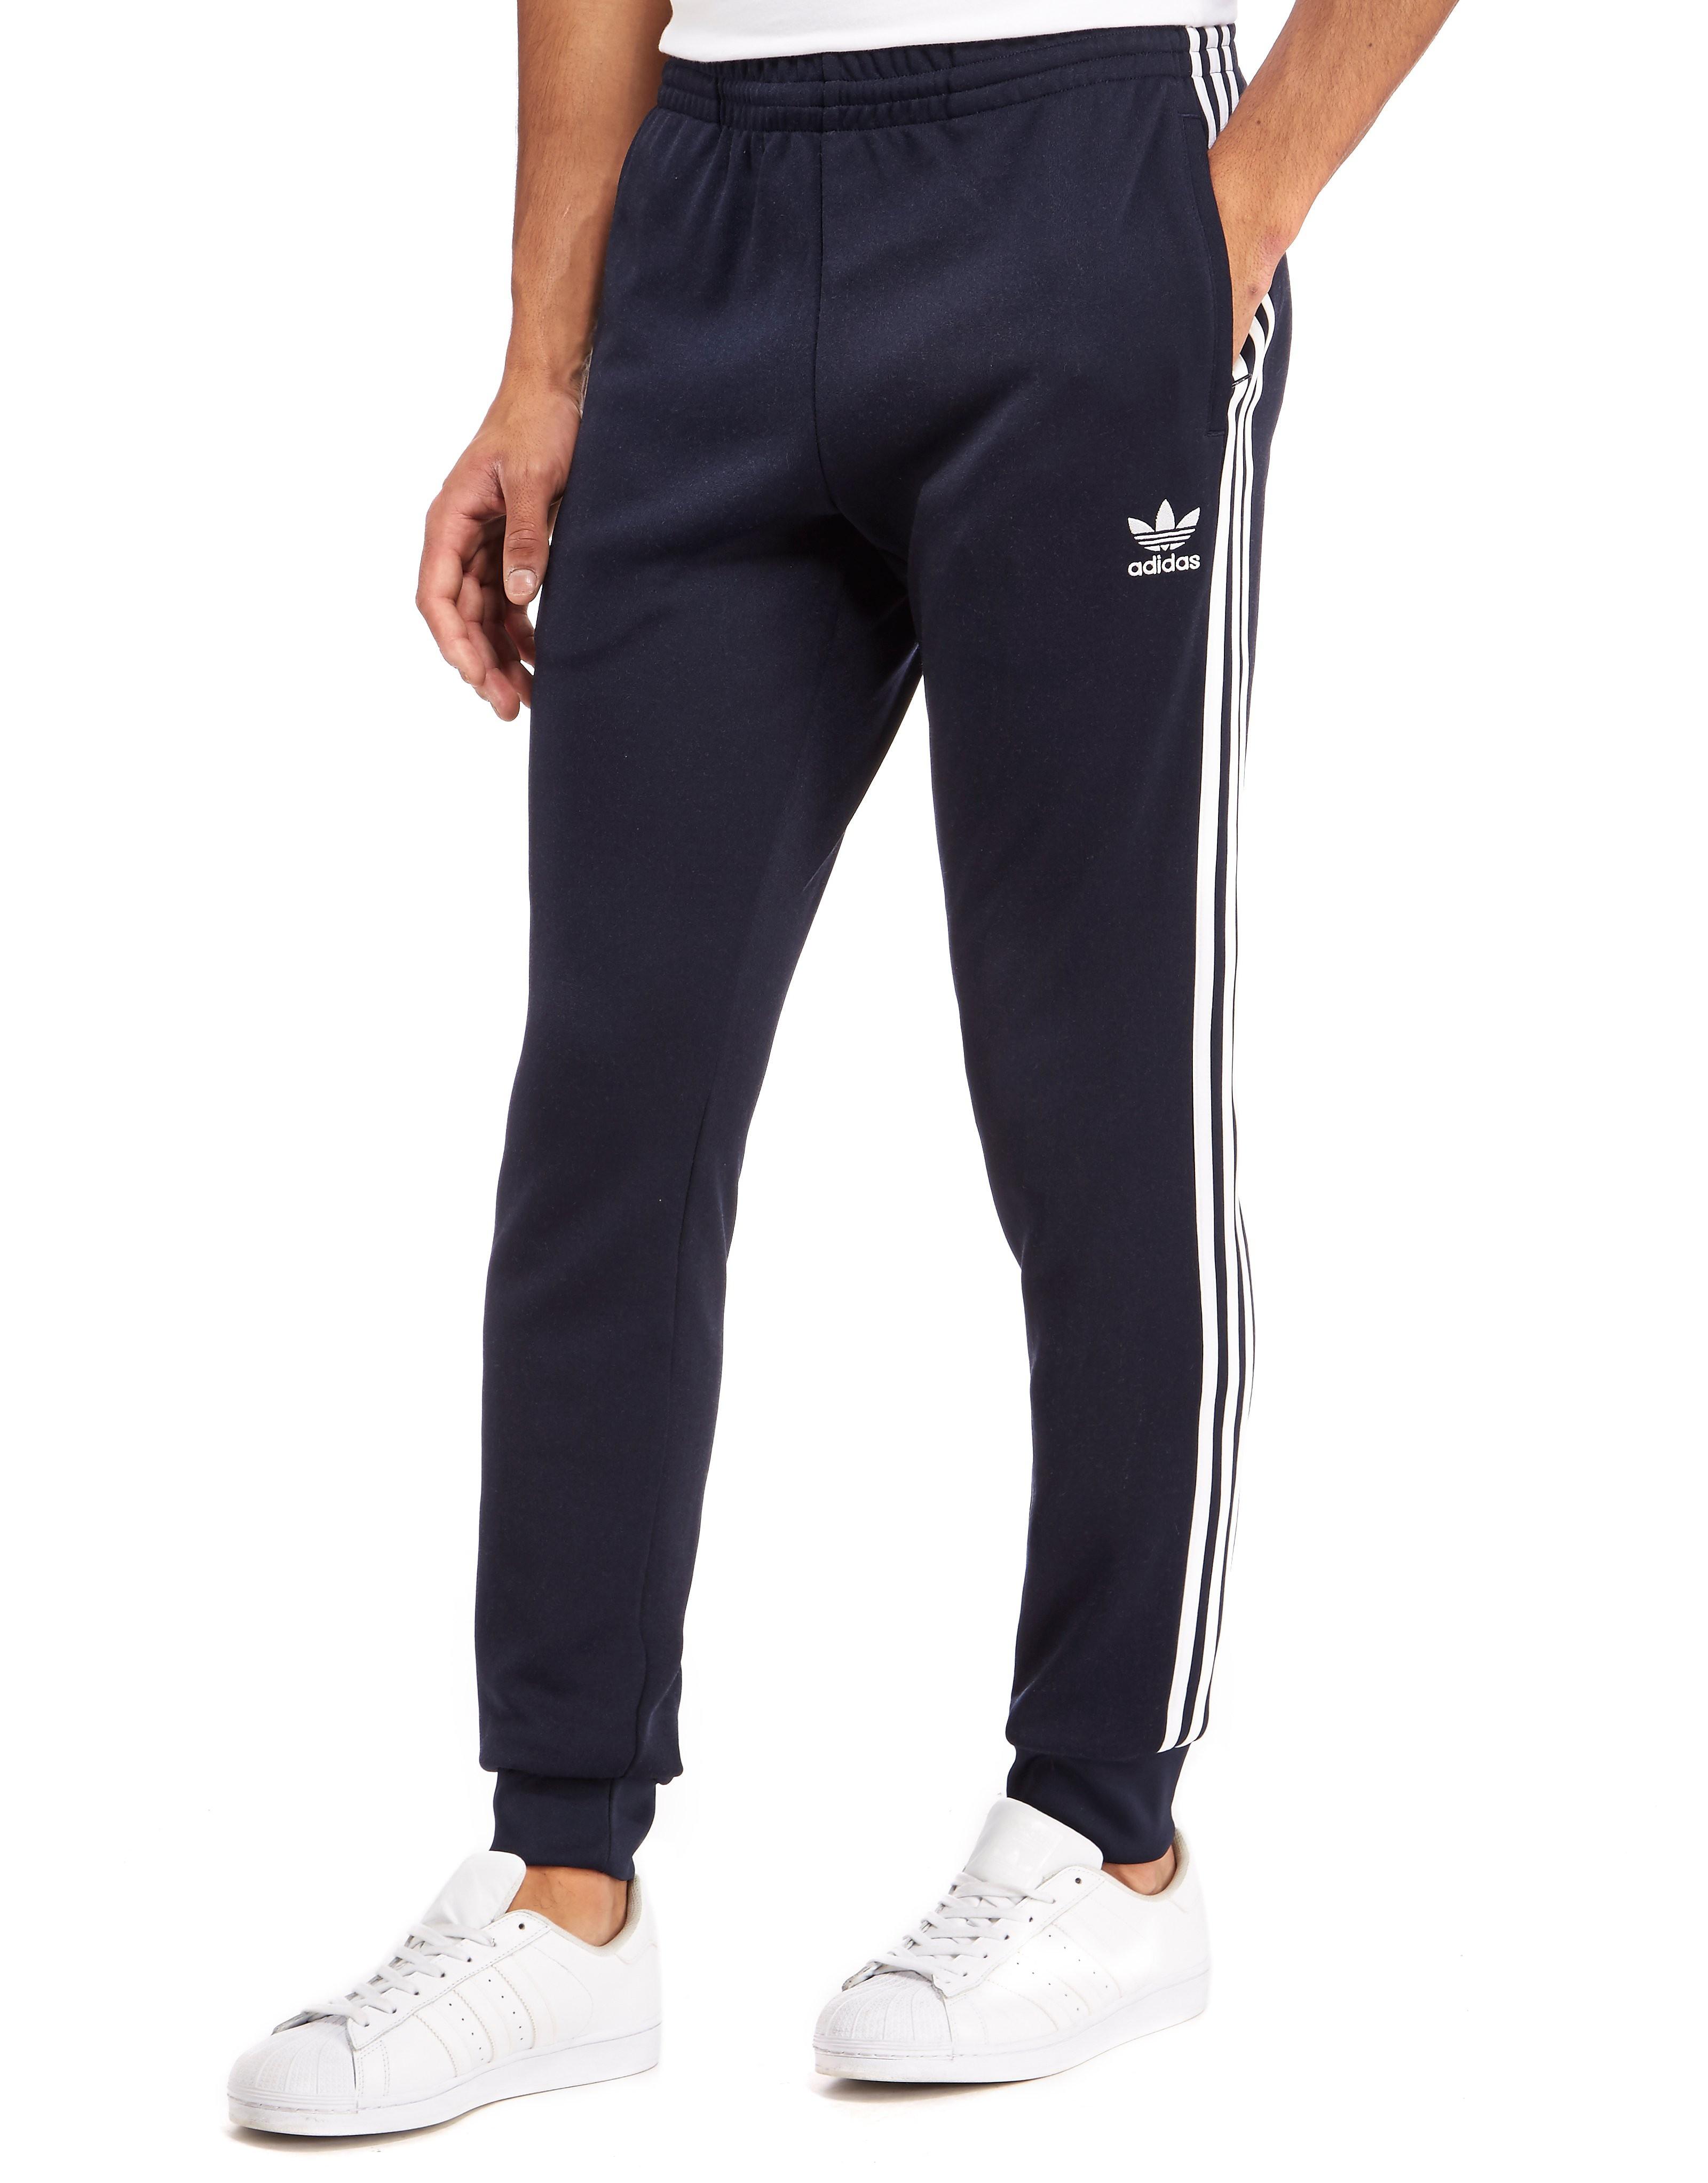 adidas Originals Superstar Poly Track Pants